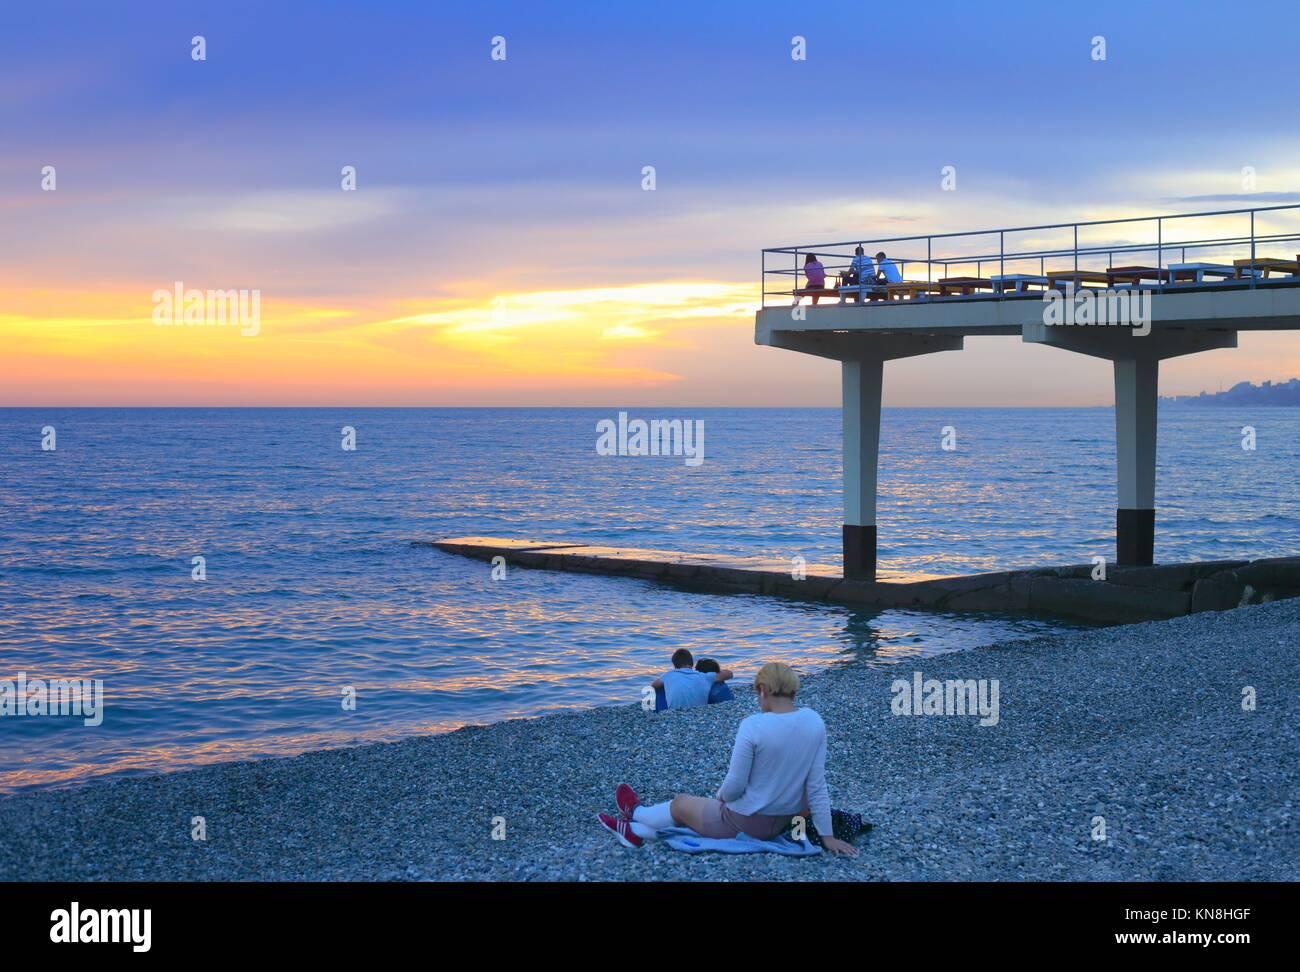 People sitting at Sochi seashore at evening. - Stock Image